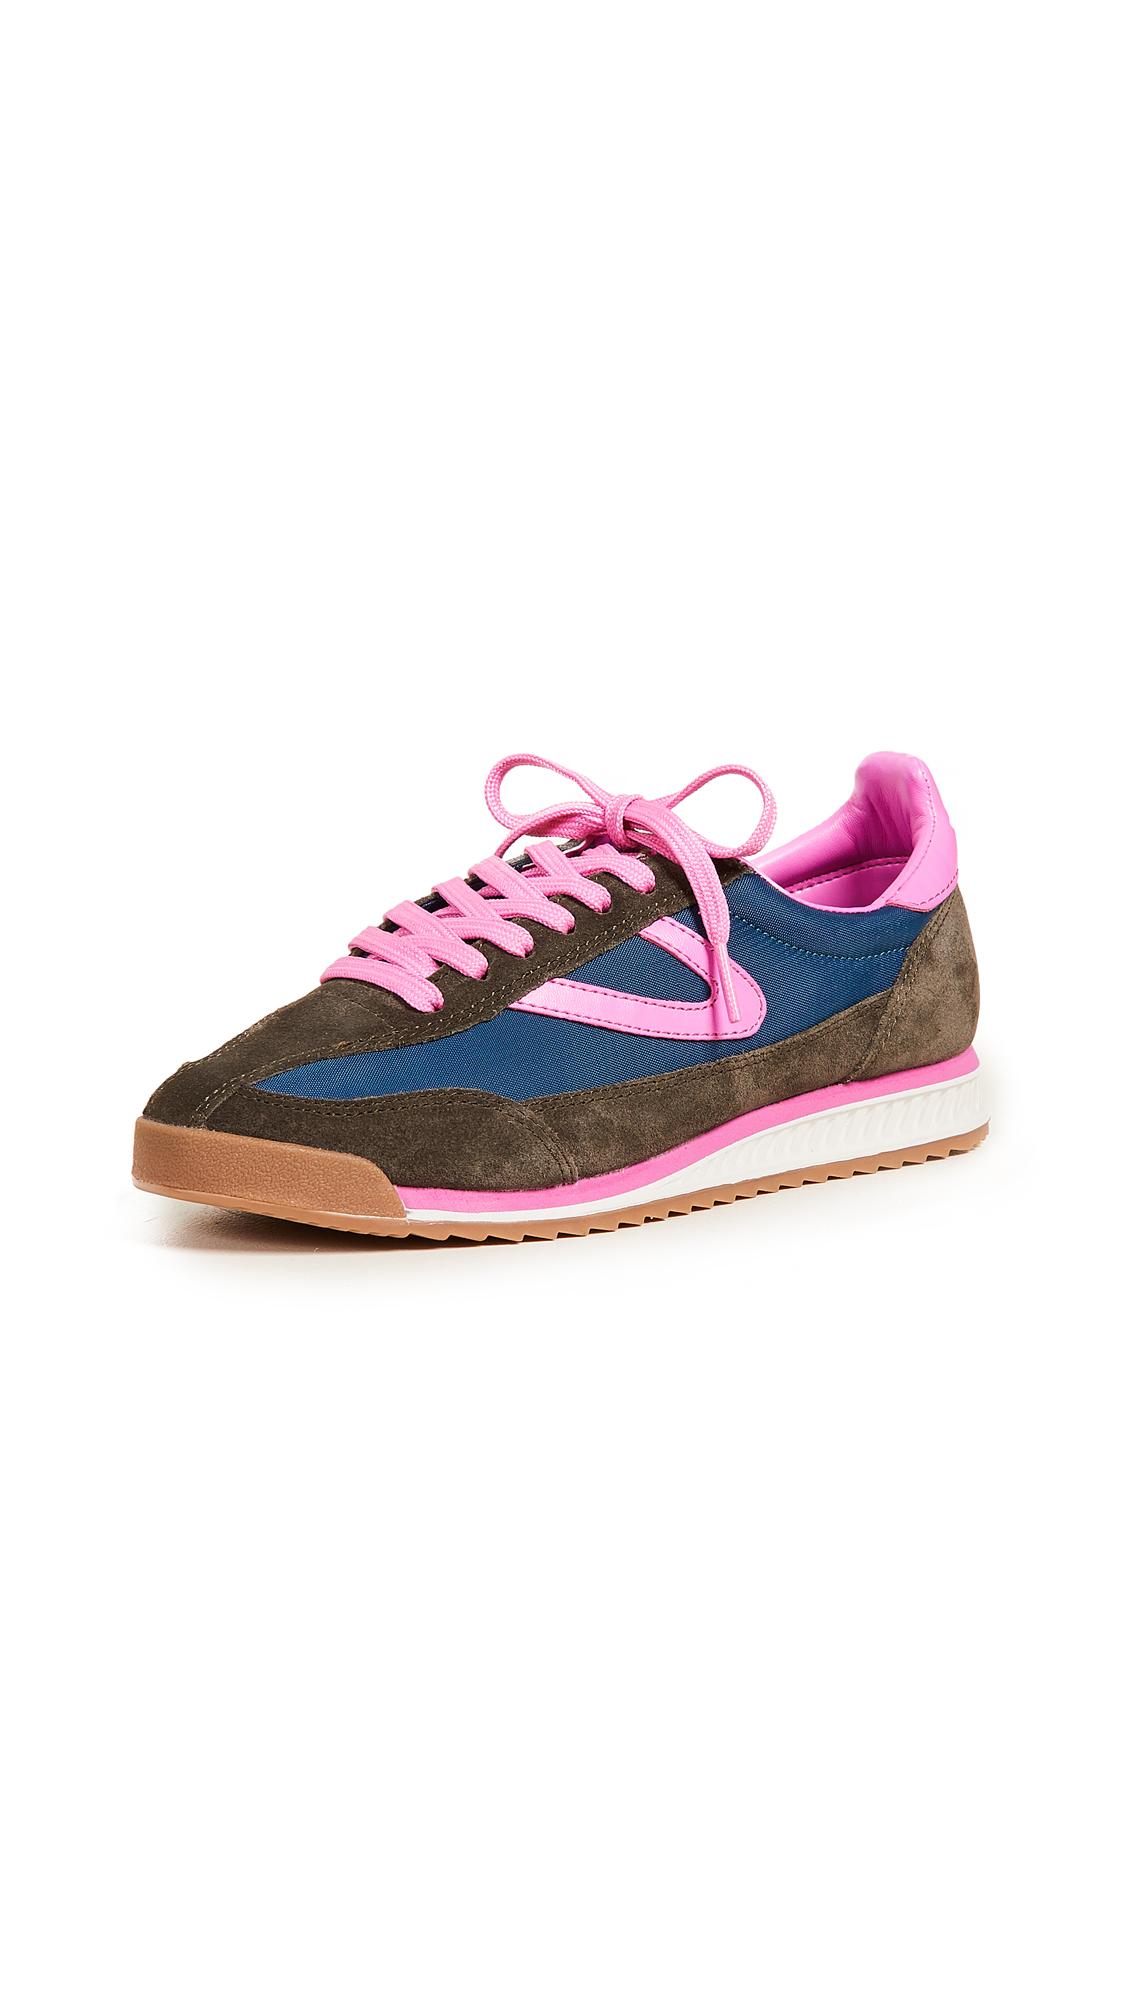 Tretorn Rawlins III Jogger Sneakers - Ivy/Blue/Fuchsia